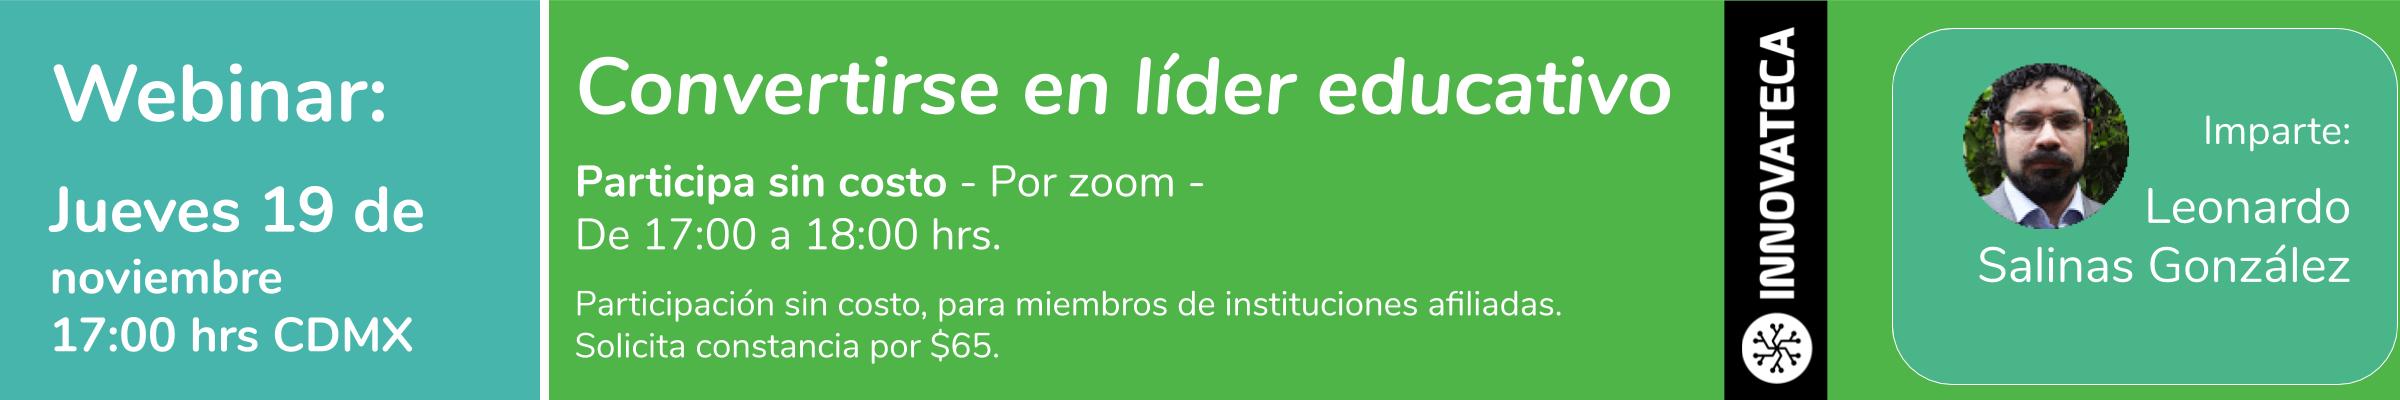 Webinar Innovateca Convertirse en líder educativo